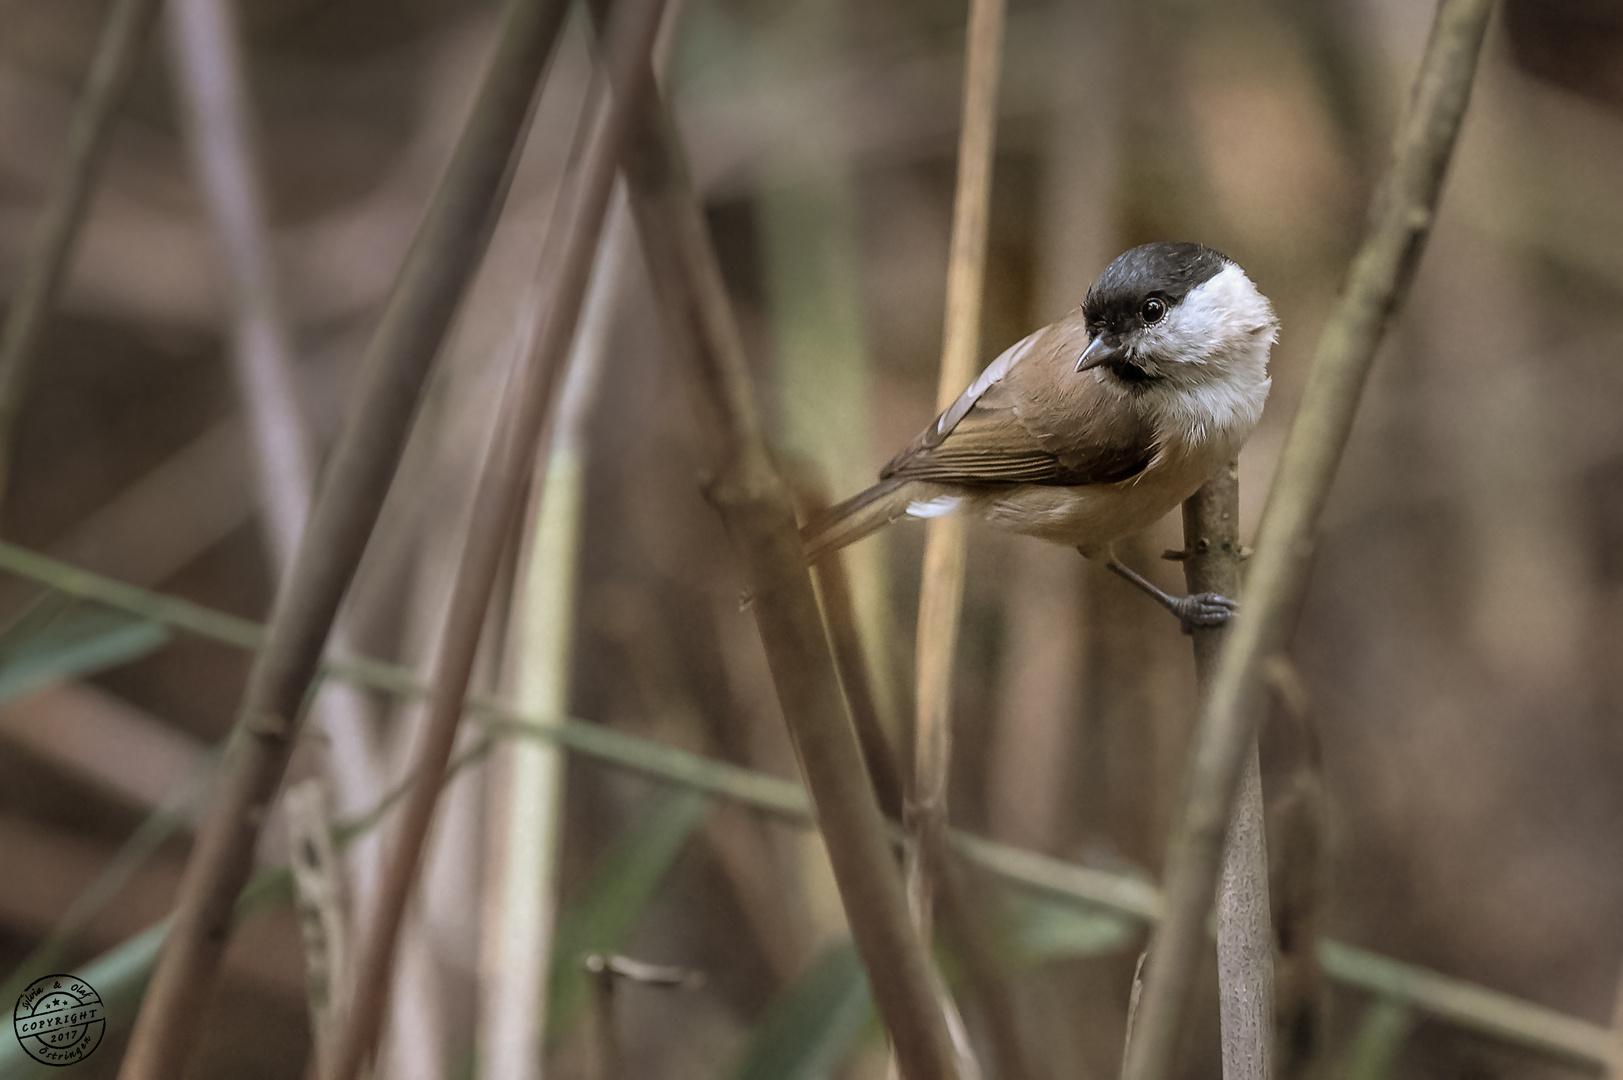 Sumpfmeise auch Nonnenmeise (Poecile palustris)genannt